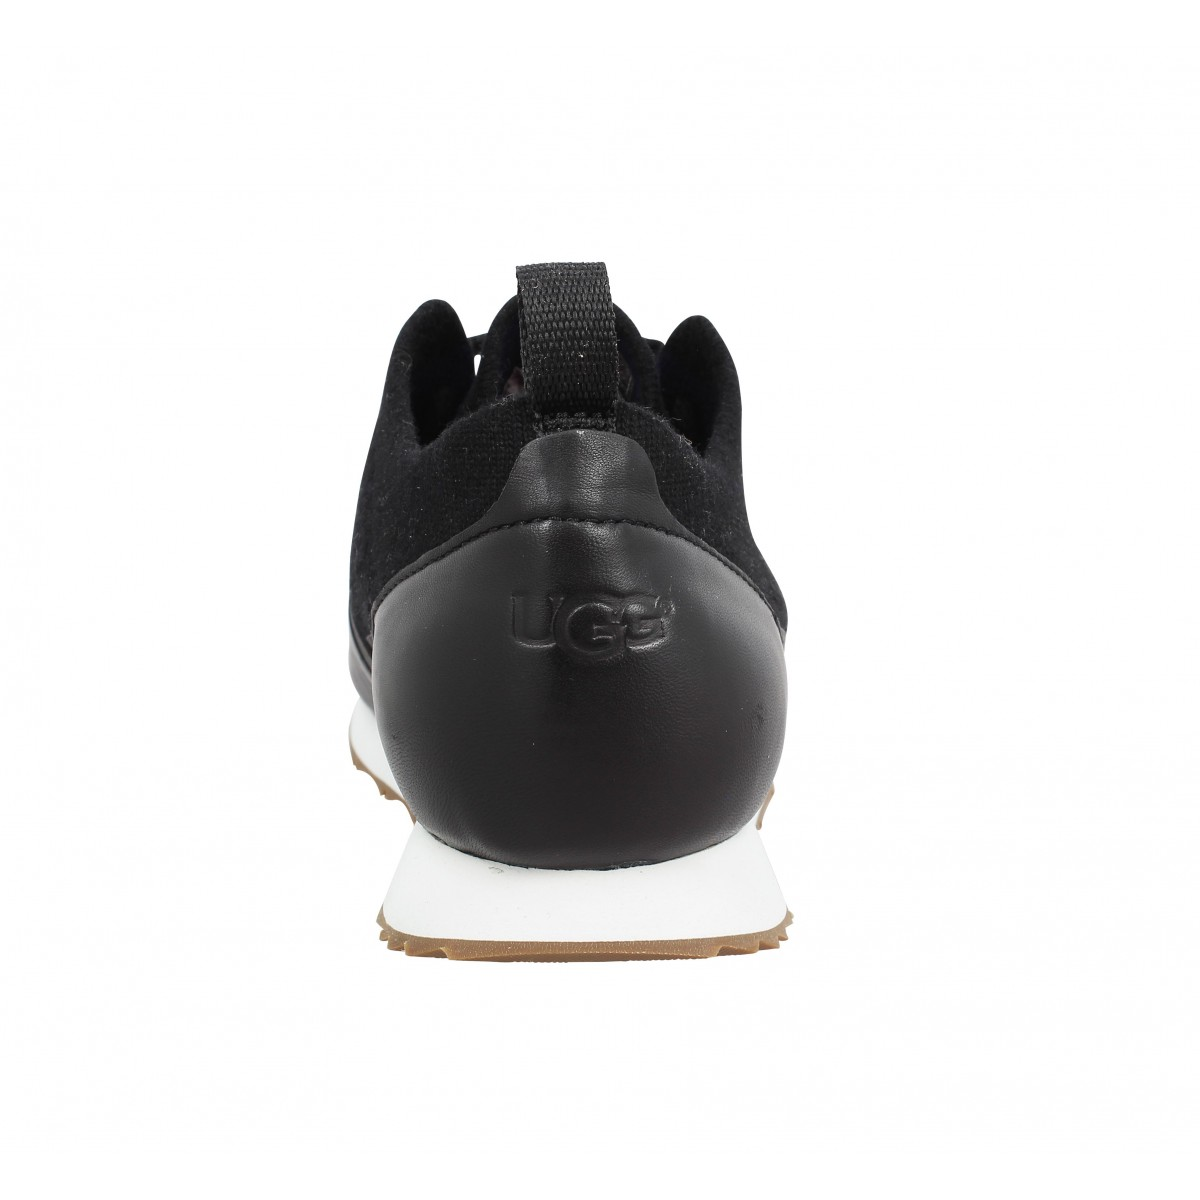 Ugg Trigo Hyperweave Cuir Homme Noir Homme Fanny Chaussures